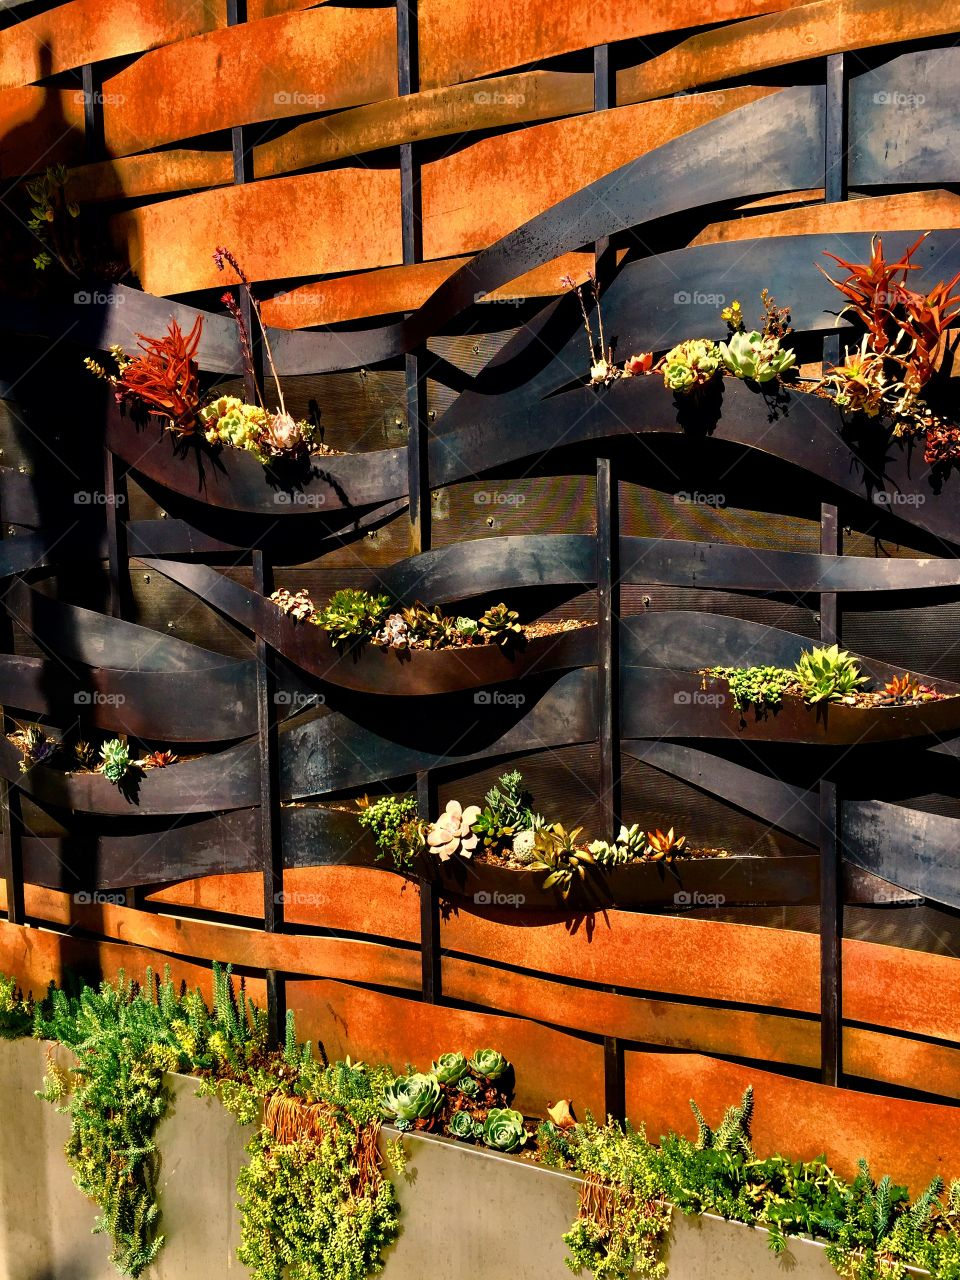 Artistic wall of succulents